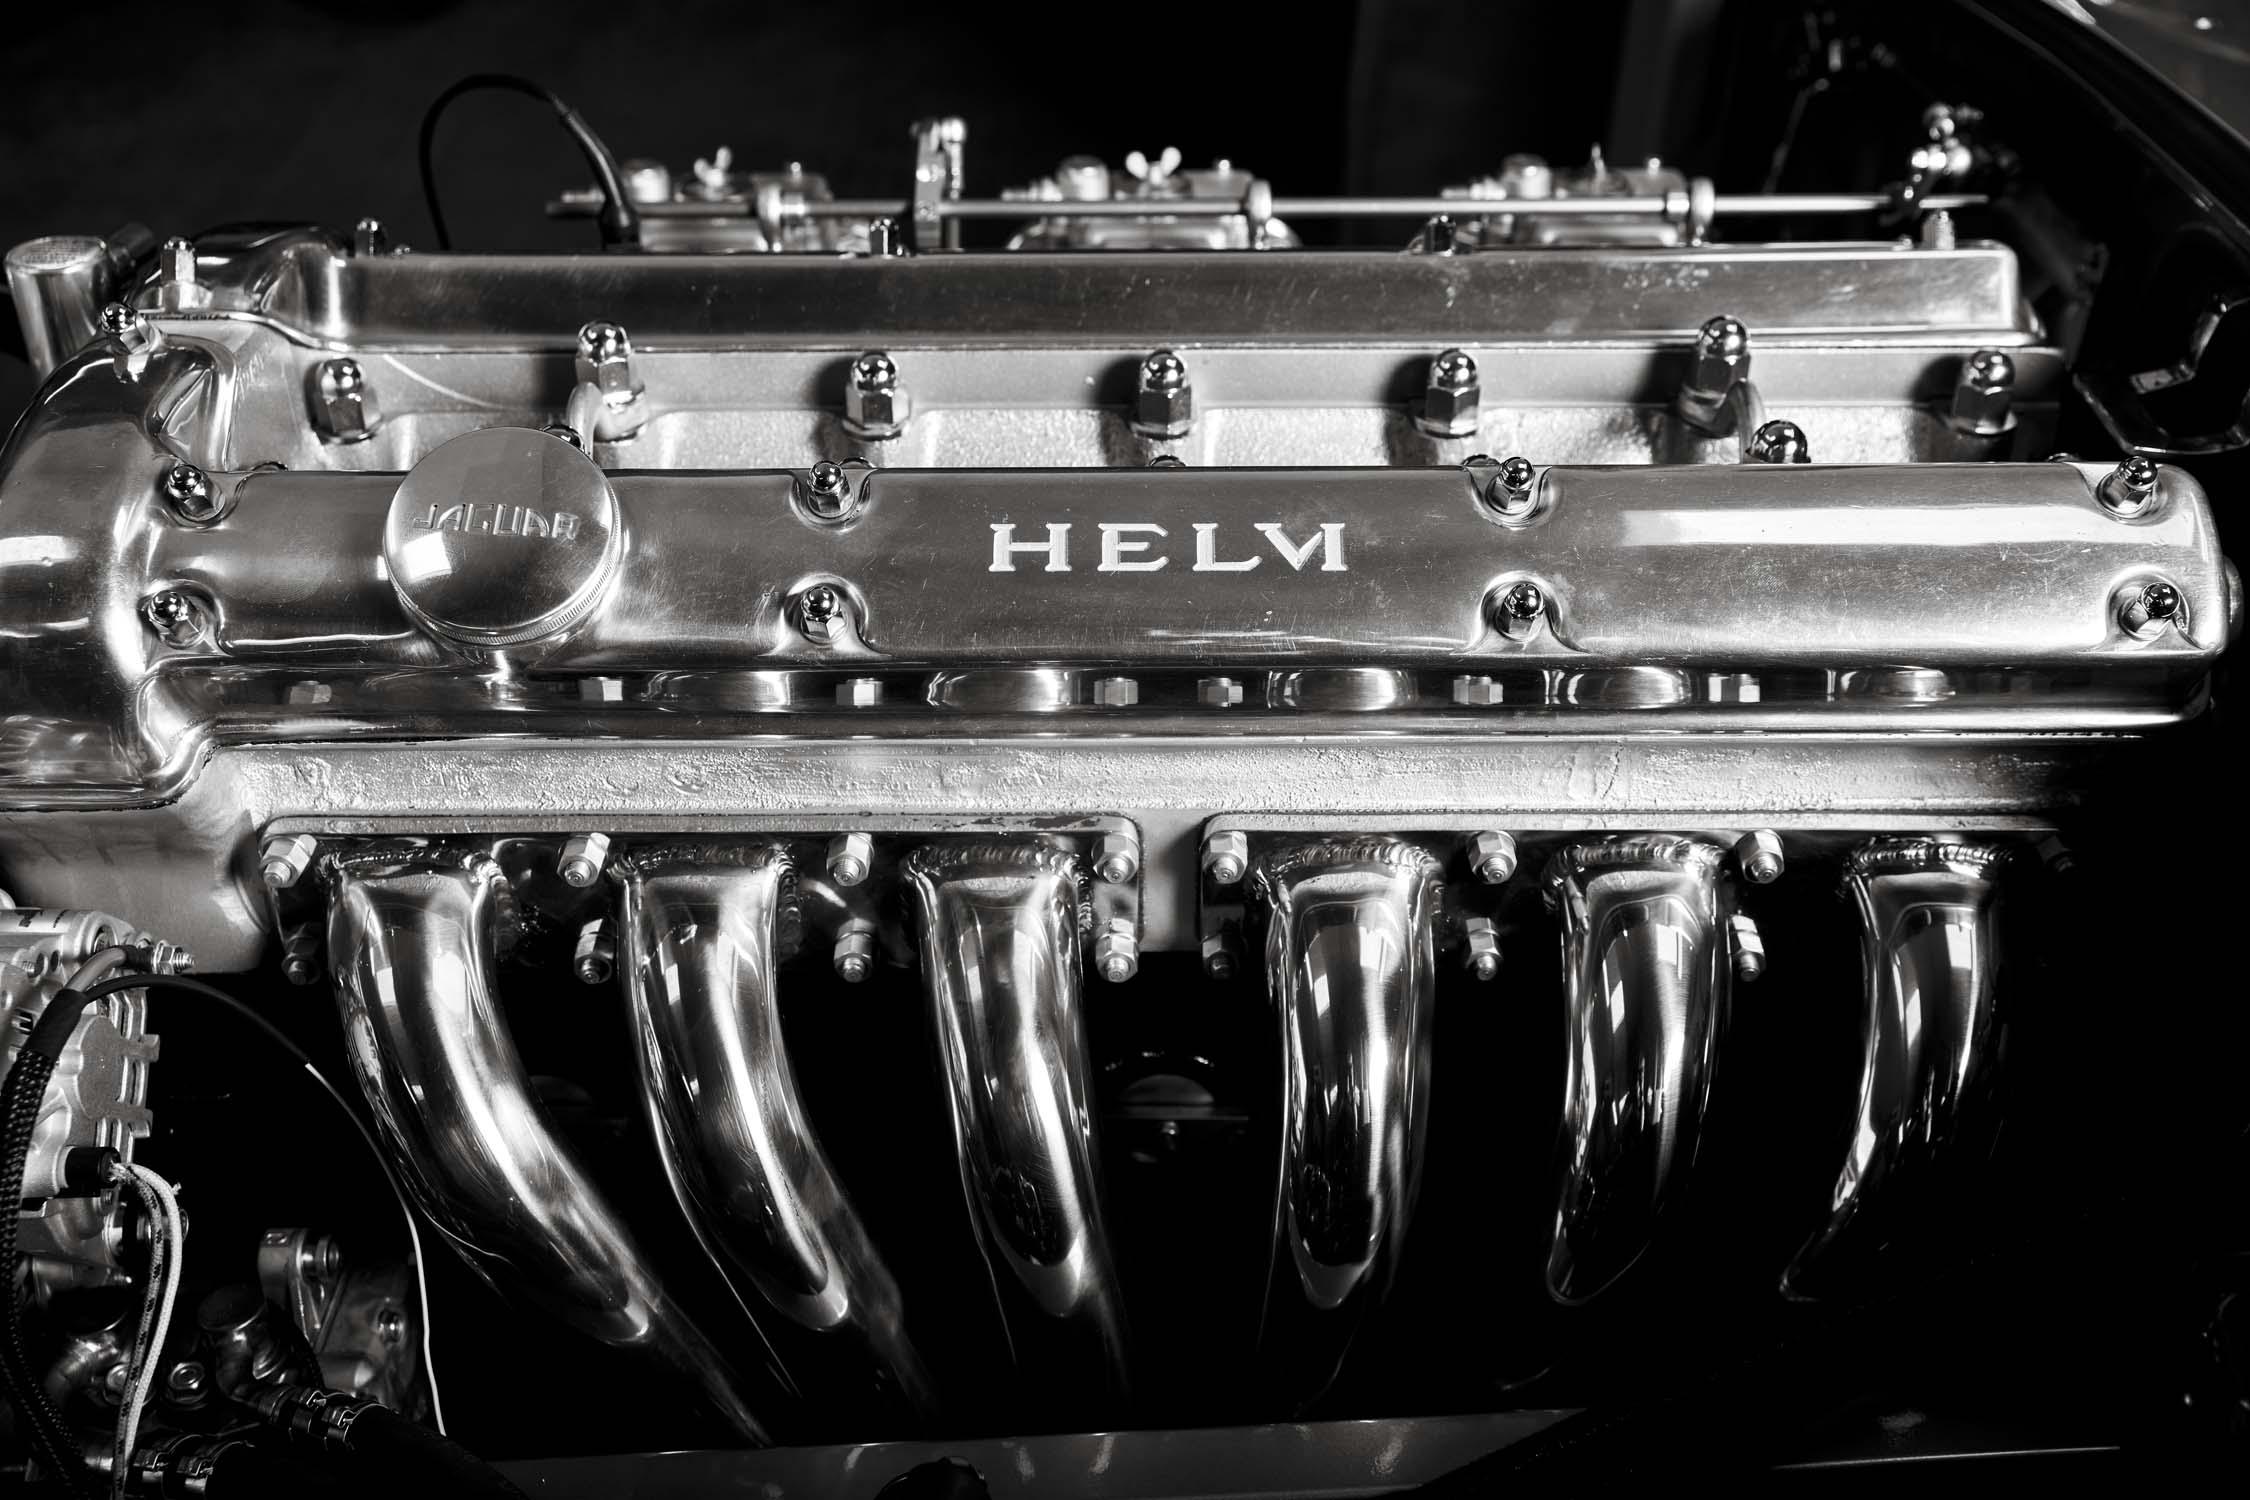 HELM E-type engine